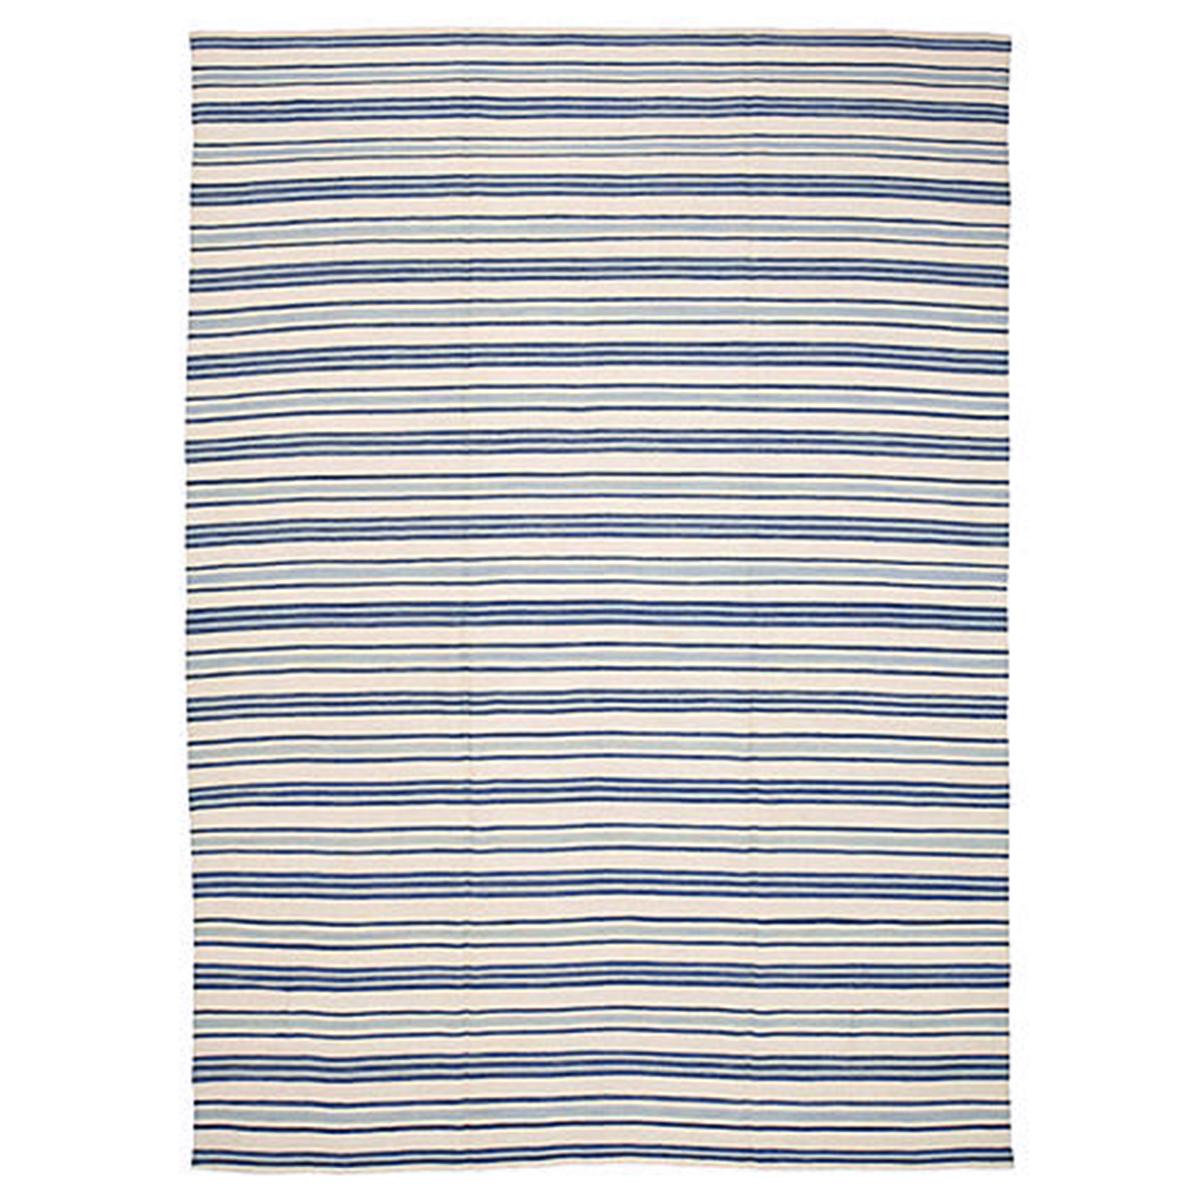 egyptian-kilim-stripe-blue-white.jpg